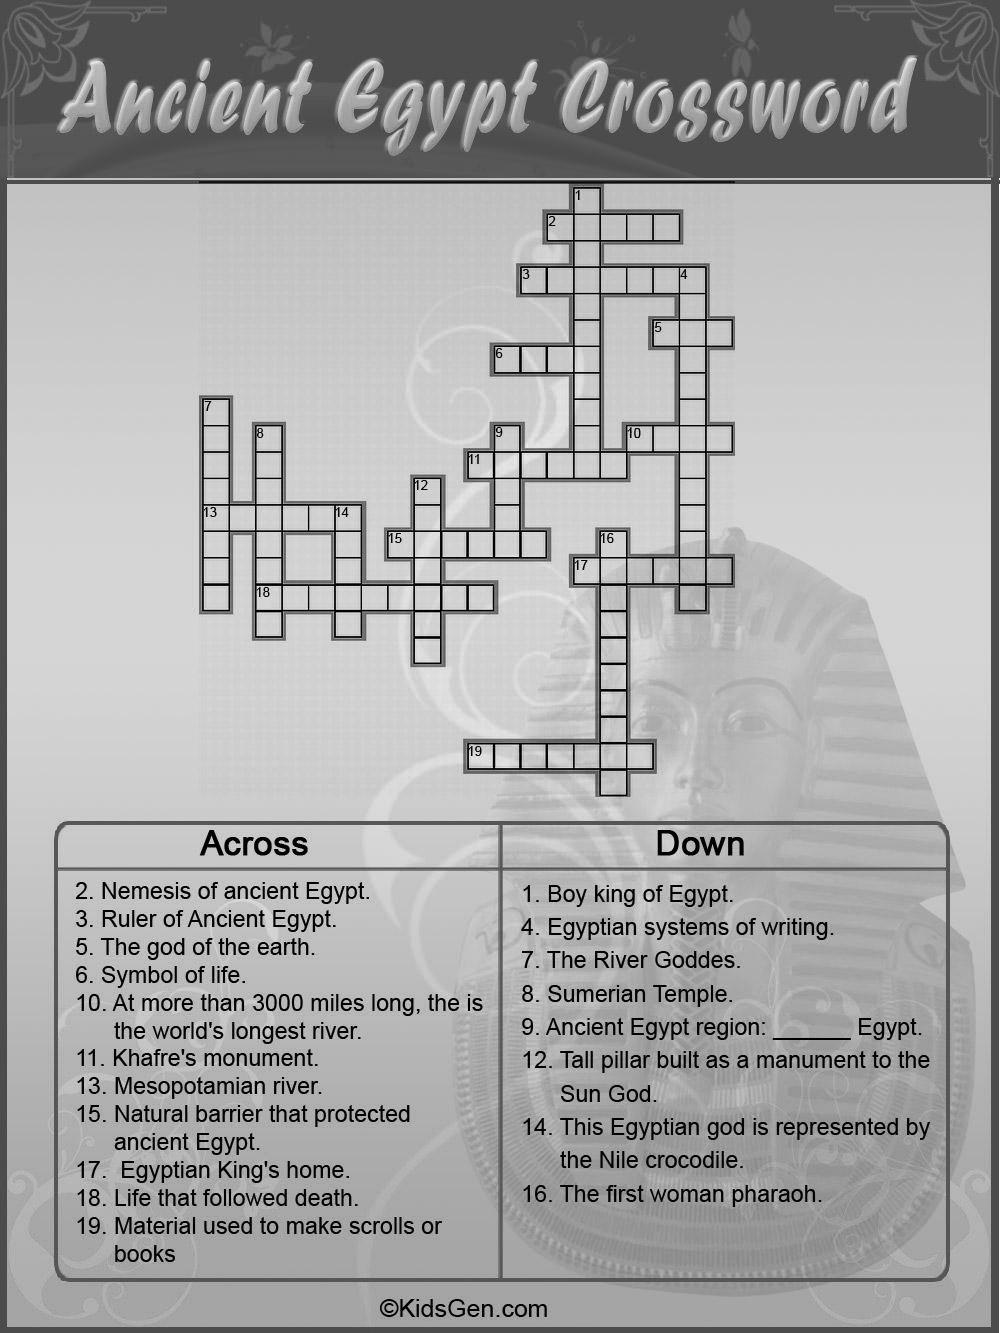 Egyptian symbols crossword puzzle sacred egyptian bird crossword download images photos biocorpaavc